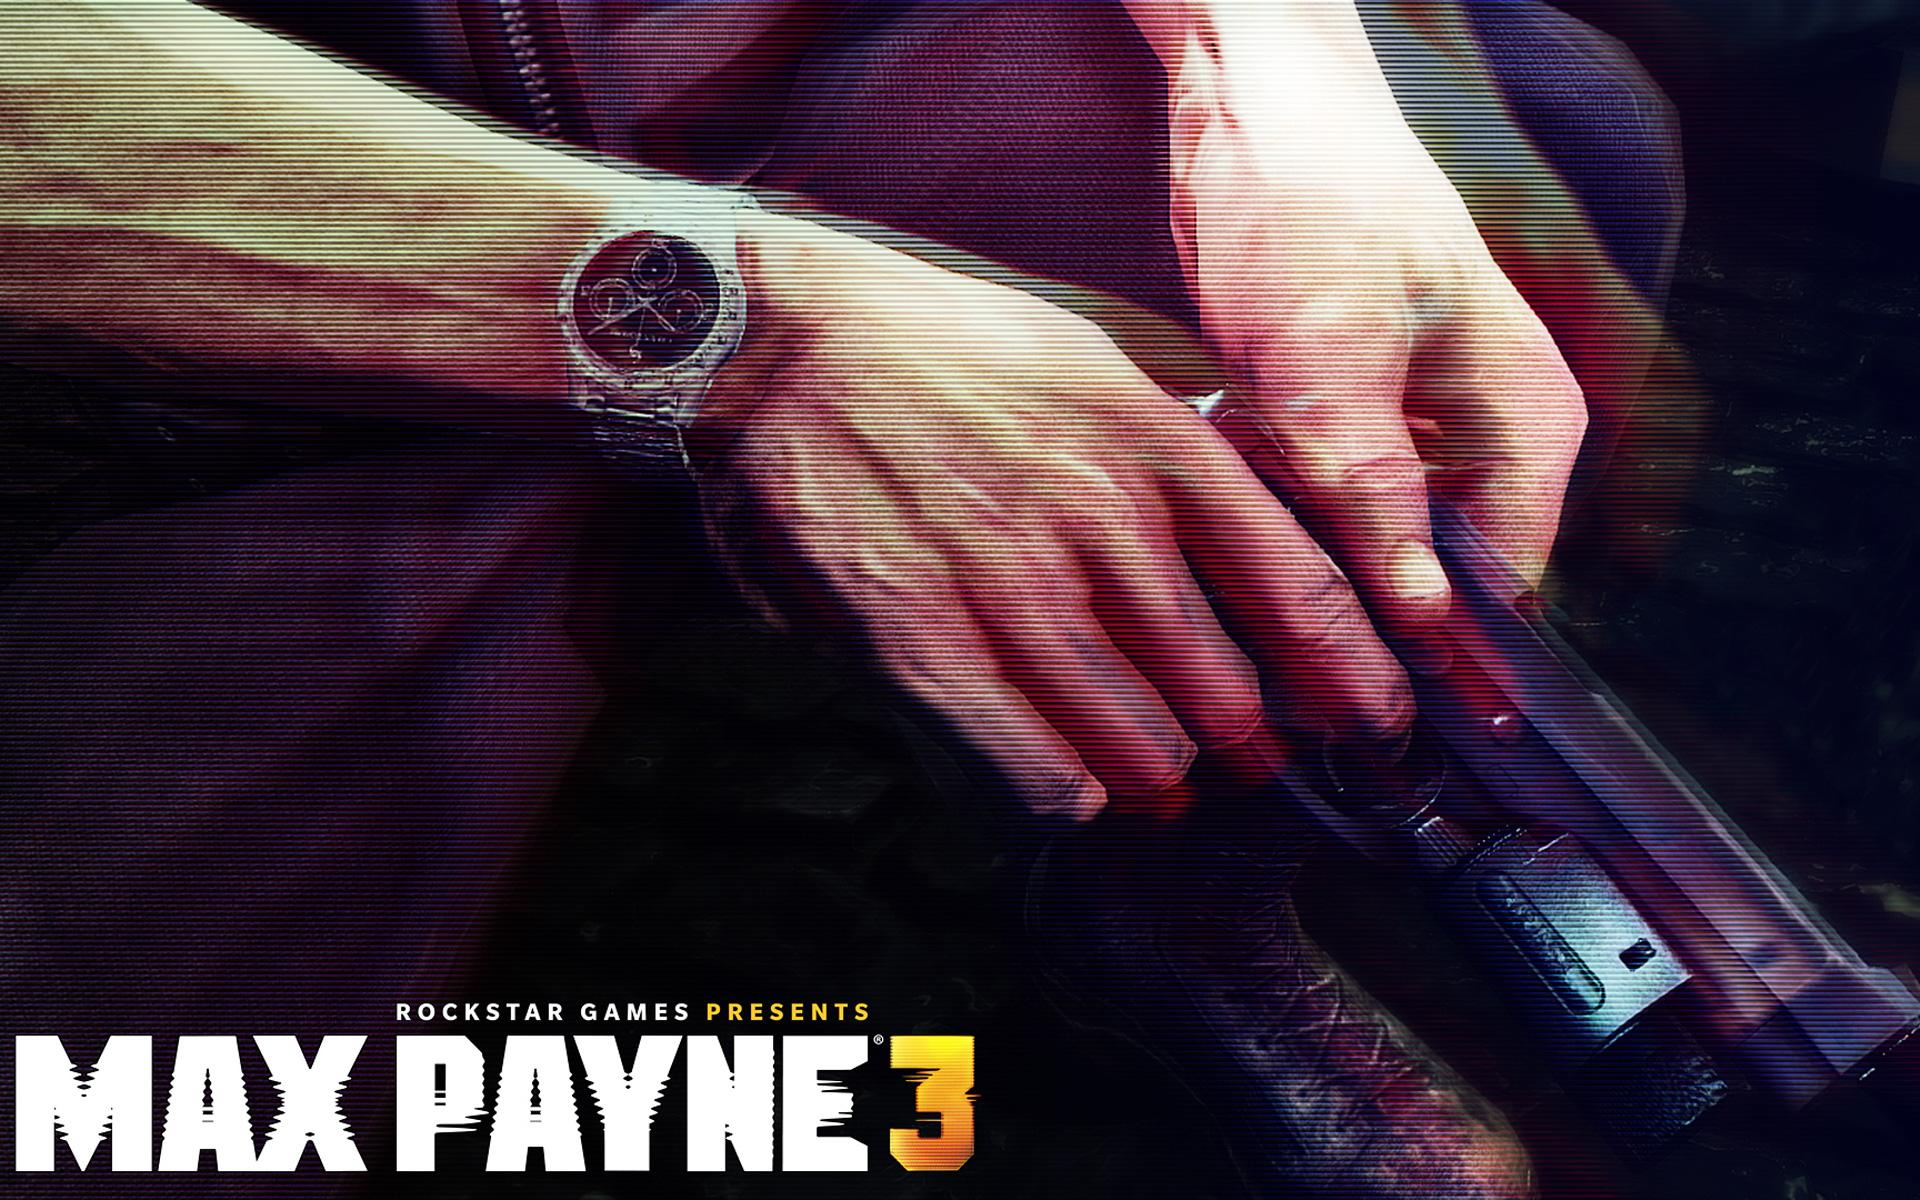 Max Payne 3 Wallpaper in 1920x1200